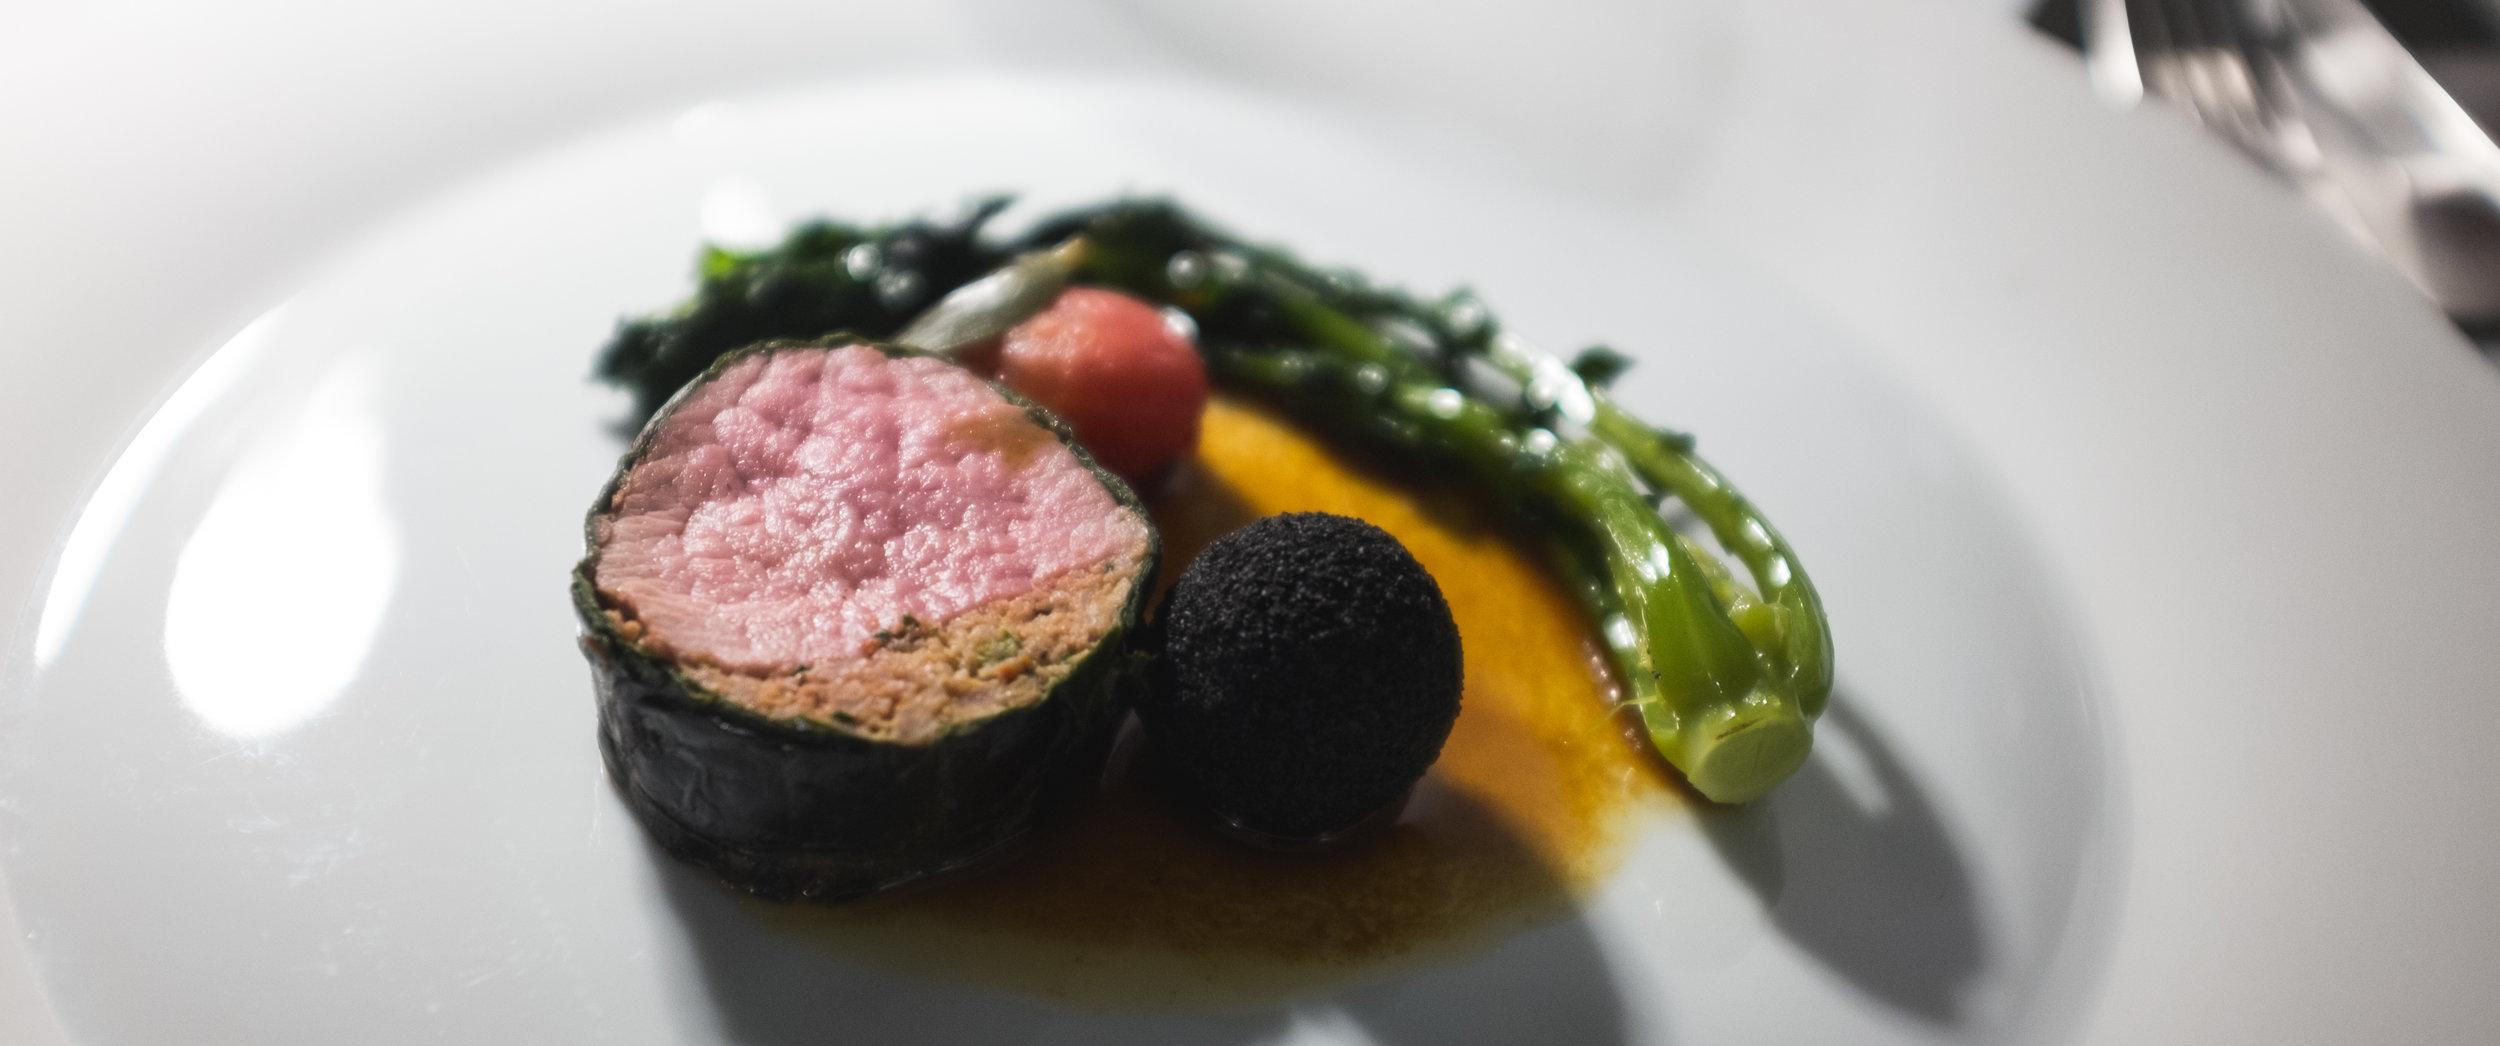 Felix Lo basso. Veršienos kepsnys su ančiuviais, brokoliais, pomidorais ir alyvyogėmis.  Felix Lo Basso. Veal steak with anchovies, broccoli, tomato and olives.